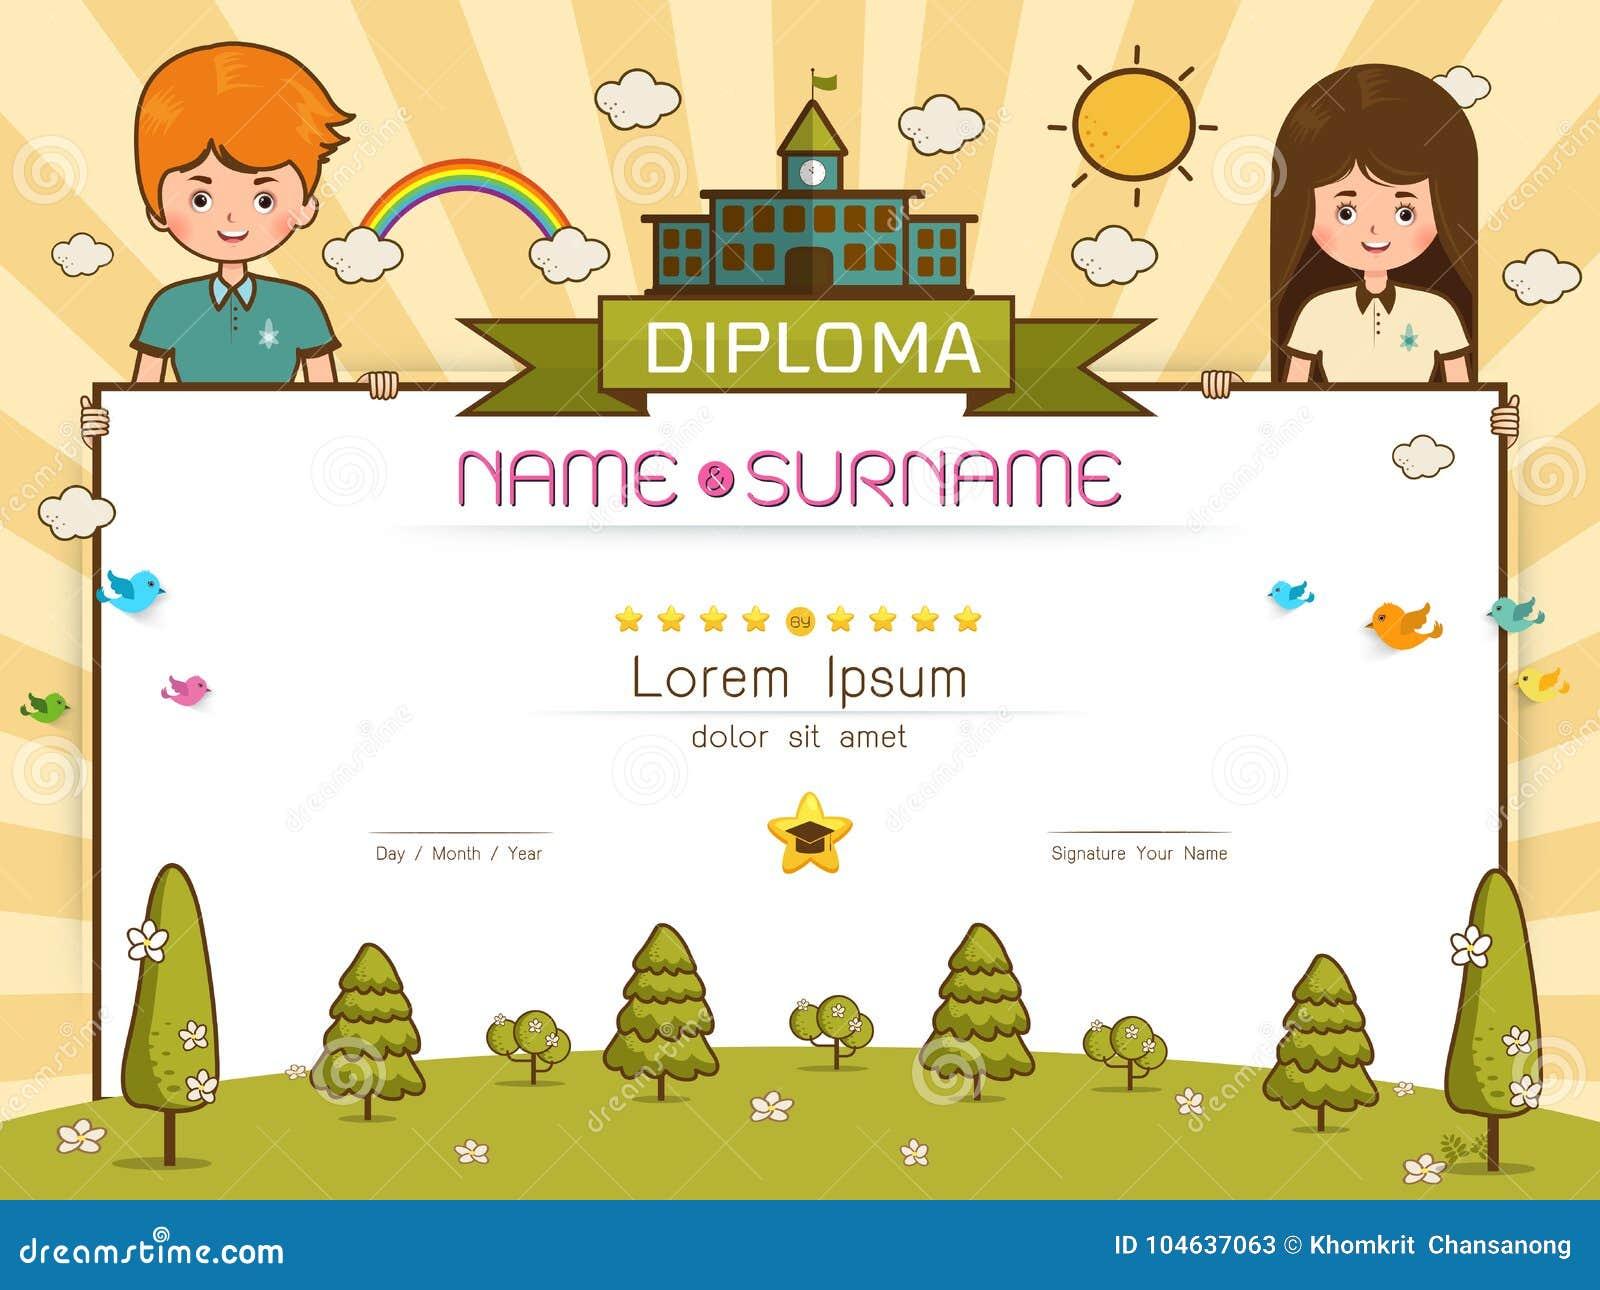 certificate kids diploma stock vector illustration of award 104637063